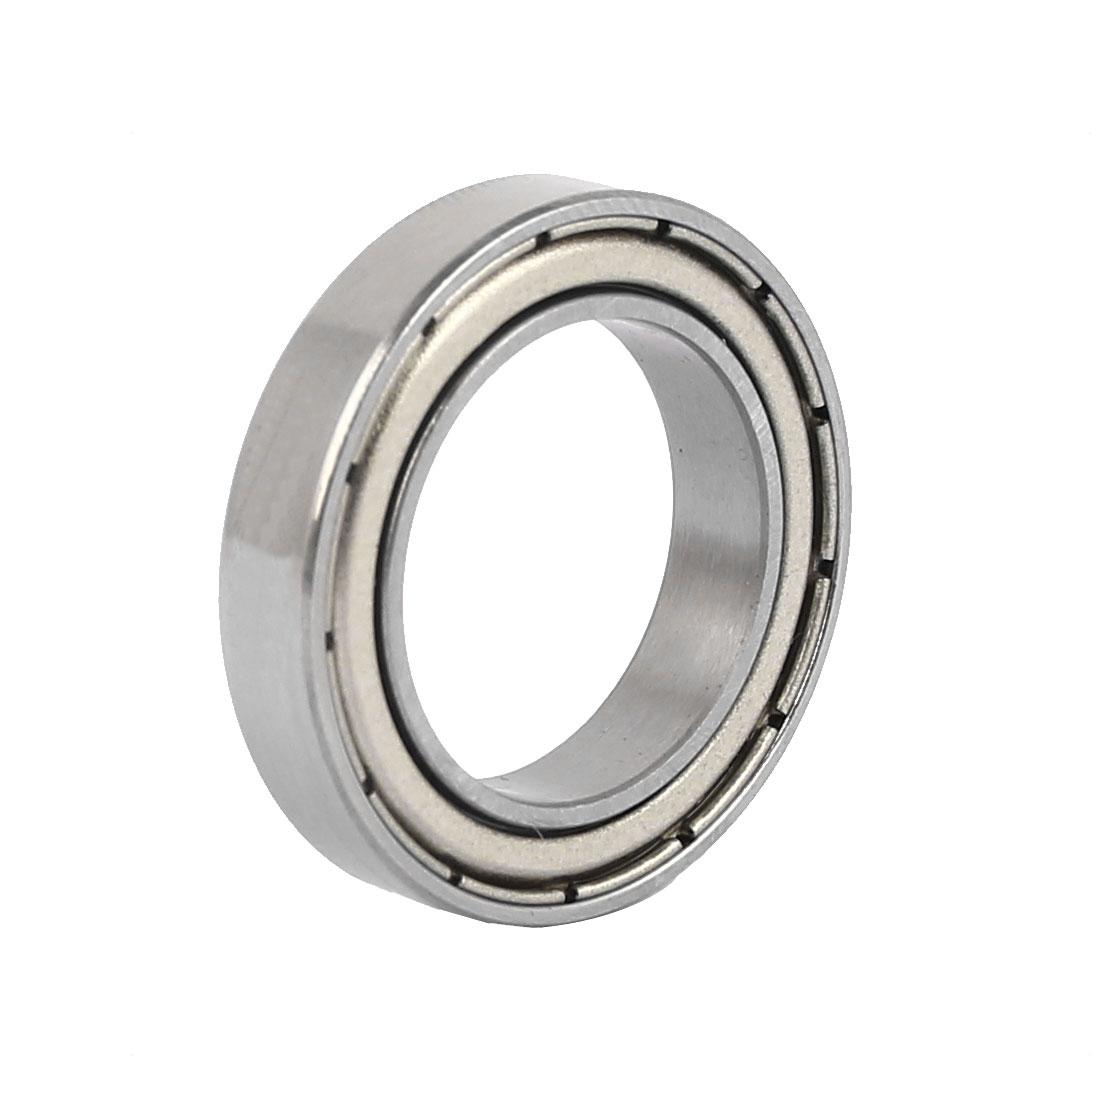 25mm x 37mm x 7mm Double Shielded Deep Groove Wheel Ball Bearing